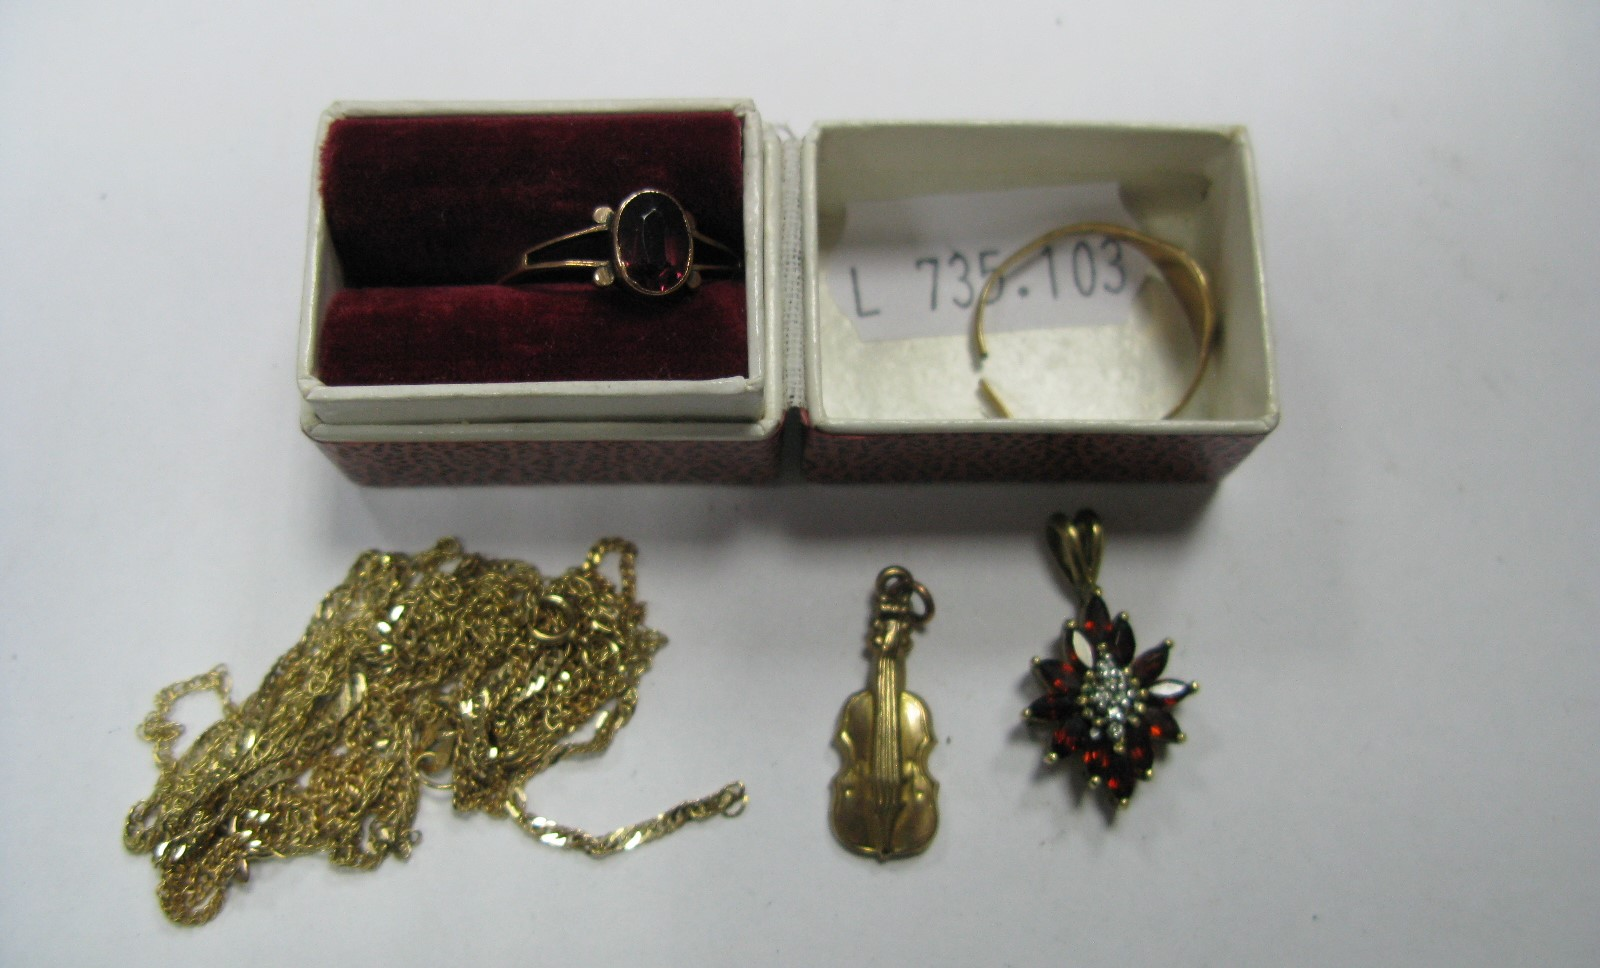 Lot 1395 - Chains, 9ct gold charm pendant, cluster pendant, rings, etc.